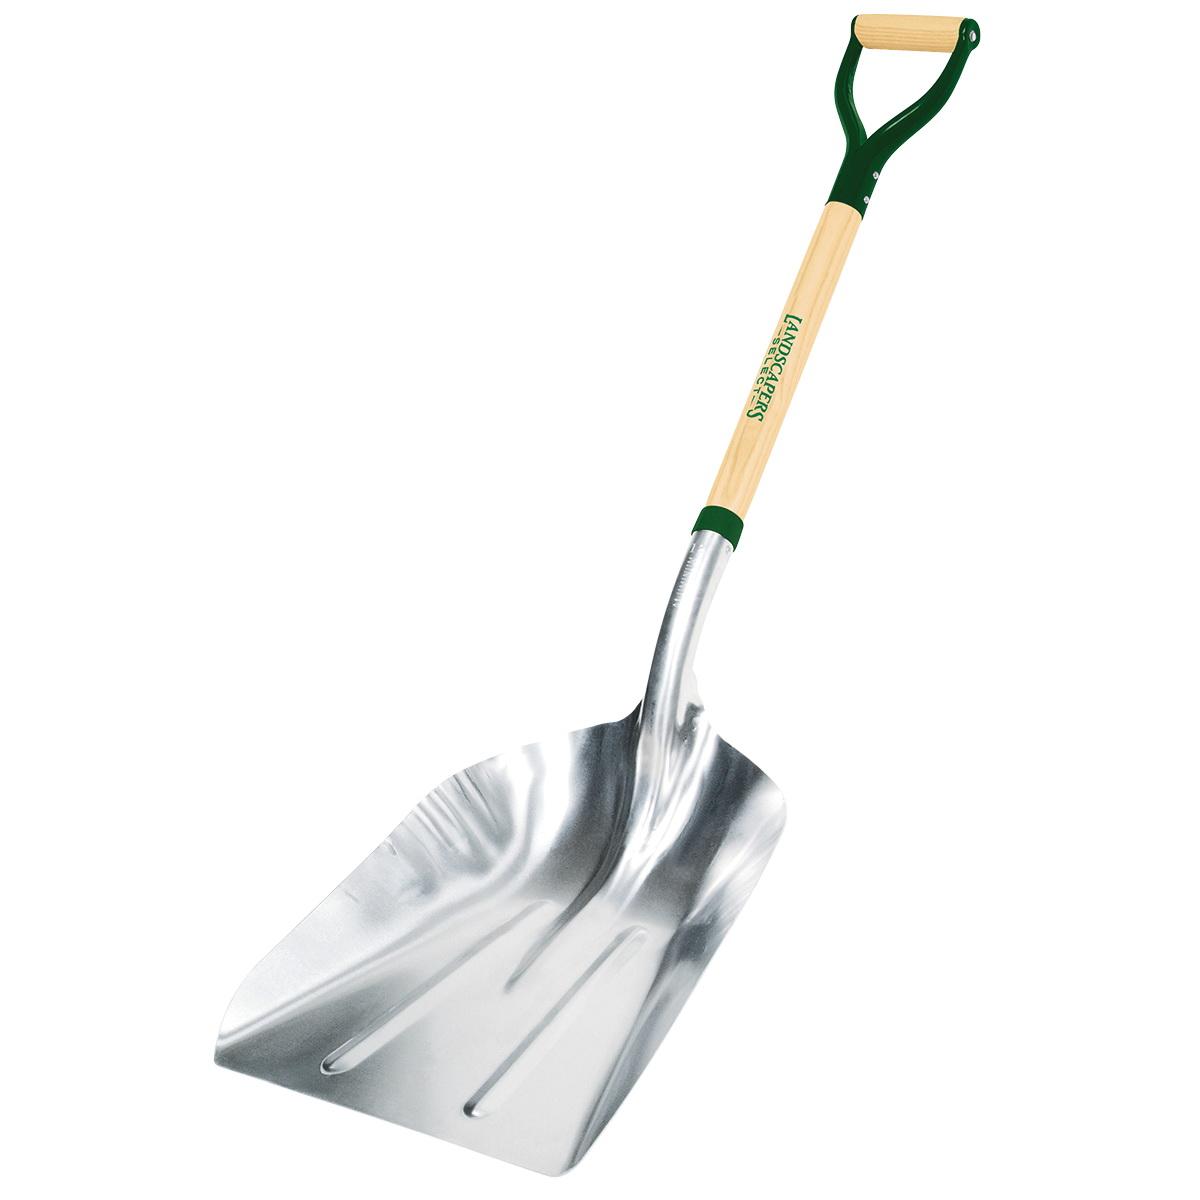 Picture of Landscapers Select 34592 Scoop Shovel, Aluminum Blade, Wood Handle, D-Shaped Handle